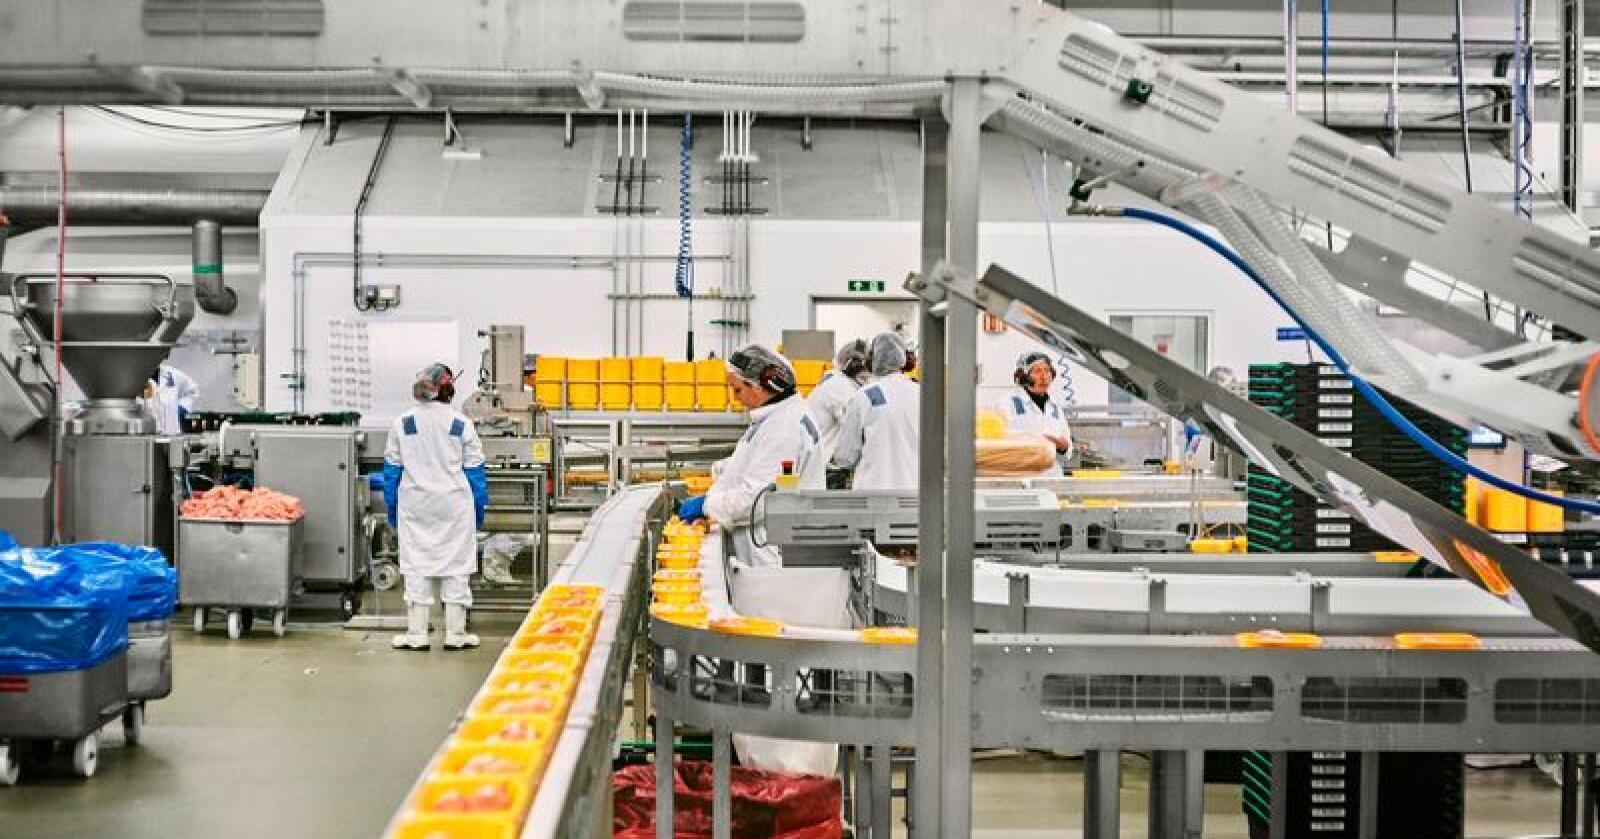 Norturas driftsinntekter i 1.tertial endte på 7,3 milliarder kroner, en økning på 2,7 prosent målt mot fjorår. Foto: Øyvind Haug